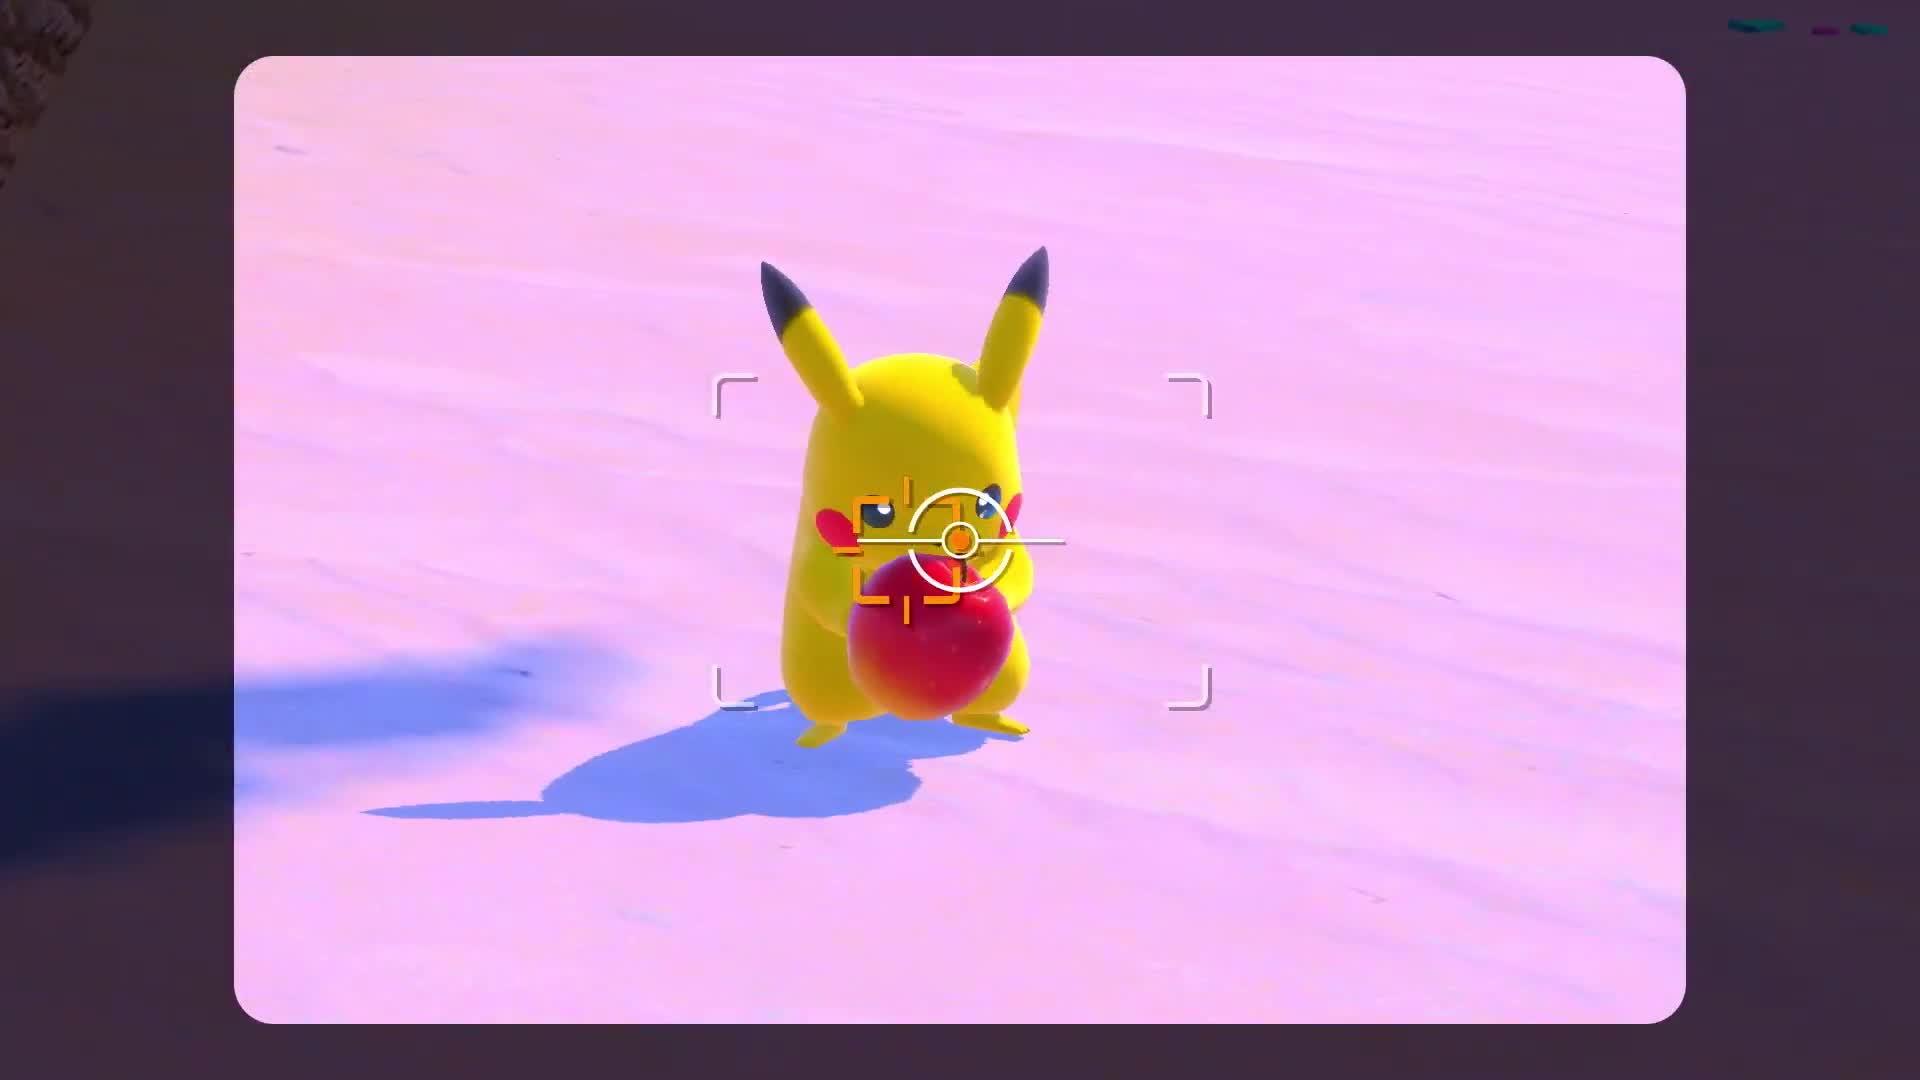 Trailer, Nintendo, Nintendo Switch, Switch, Pokemon, The Pokemon Company, New Pokémon Snap, Pokémon Snap